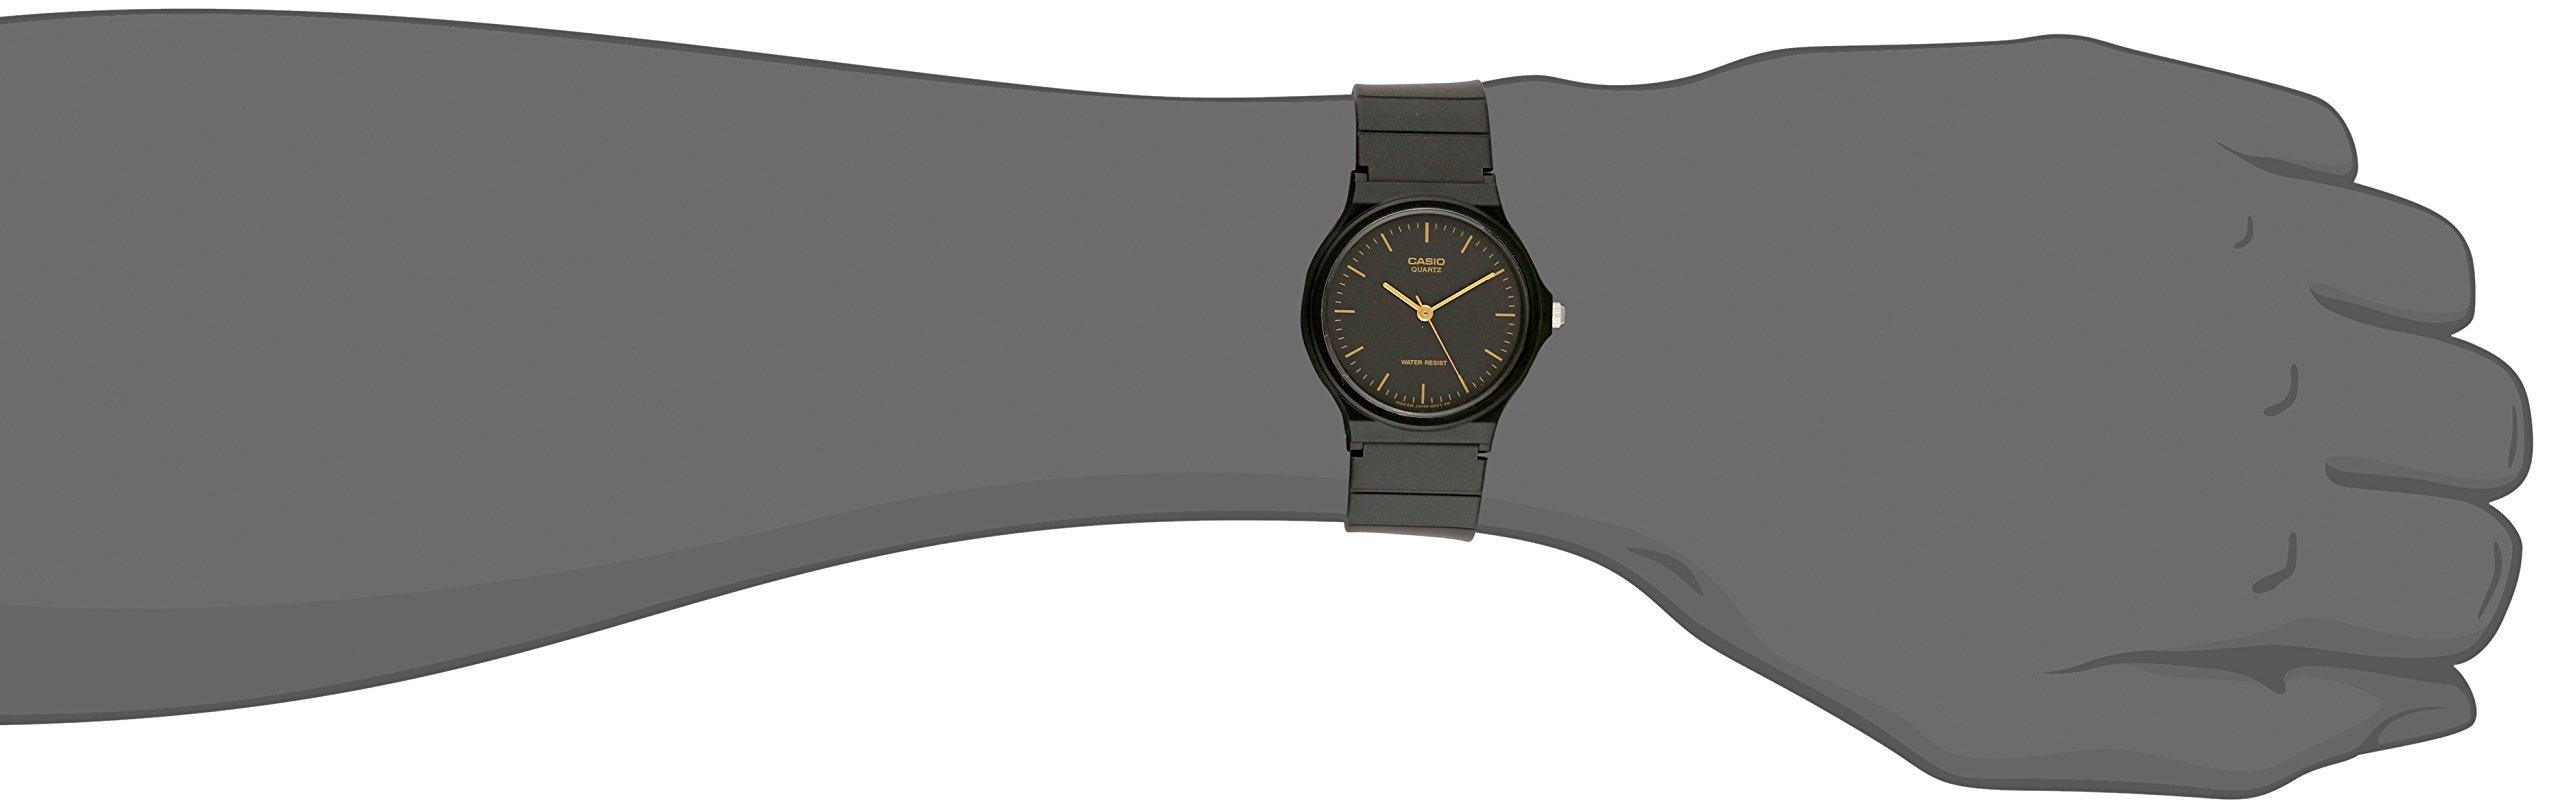 Harga Casio Mq24 Terbaru 2018 Aem Piggyback 1930 Fic8 Mens 1e Black Resin Watch Wrist Watches